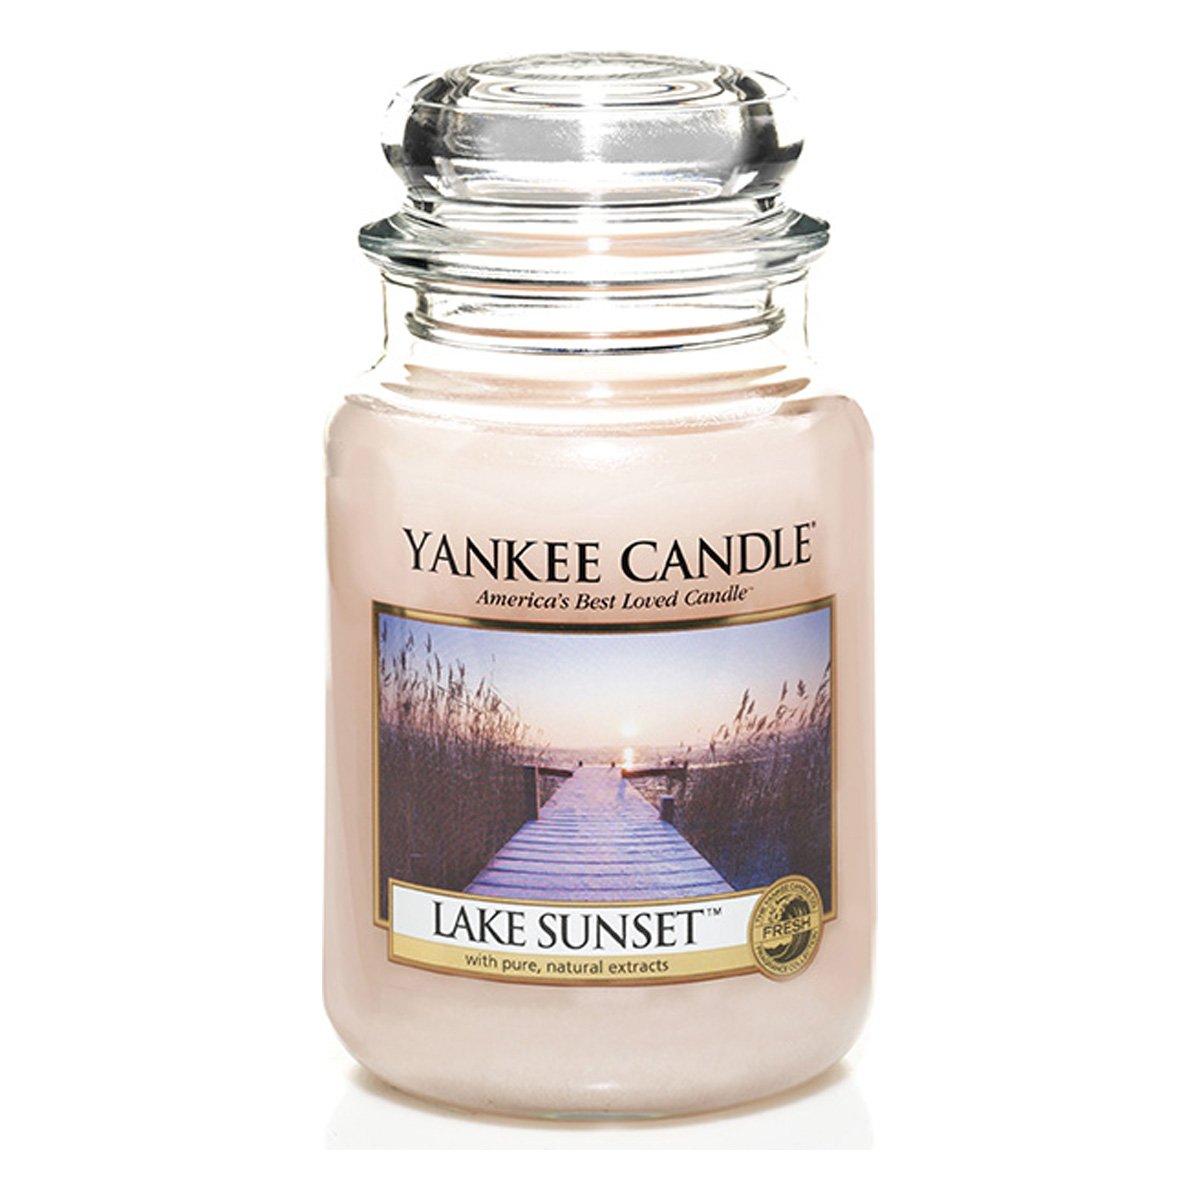 Yankee Candles Large Jar Candle - Lake Sunset